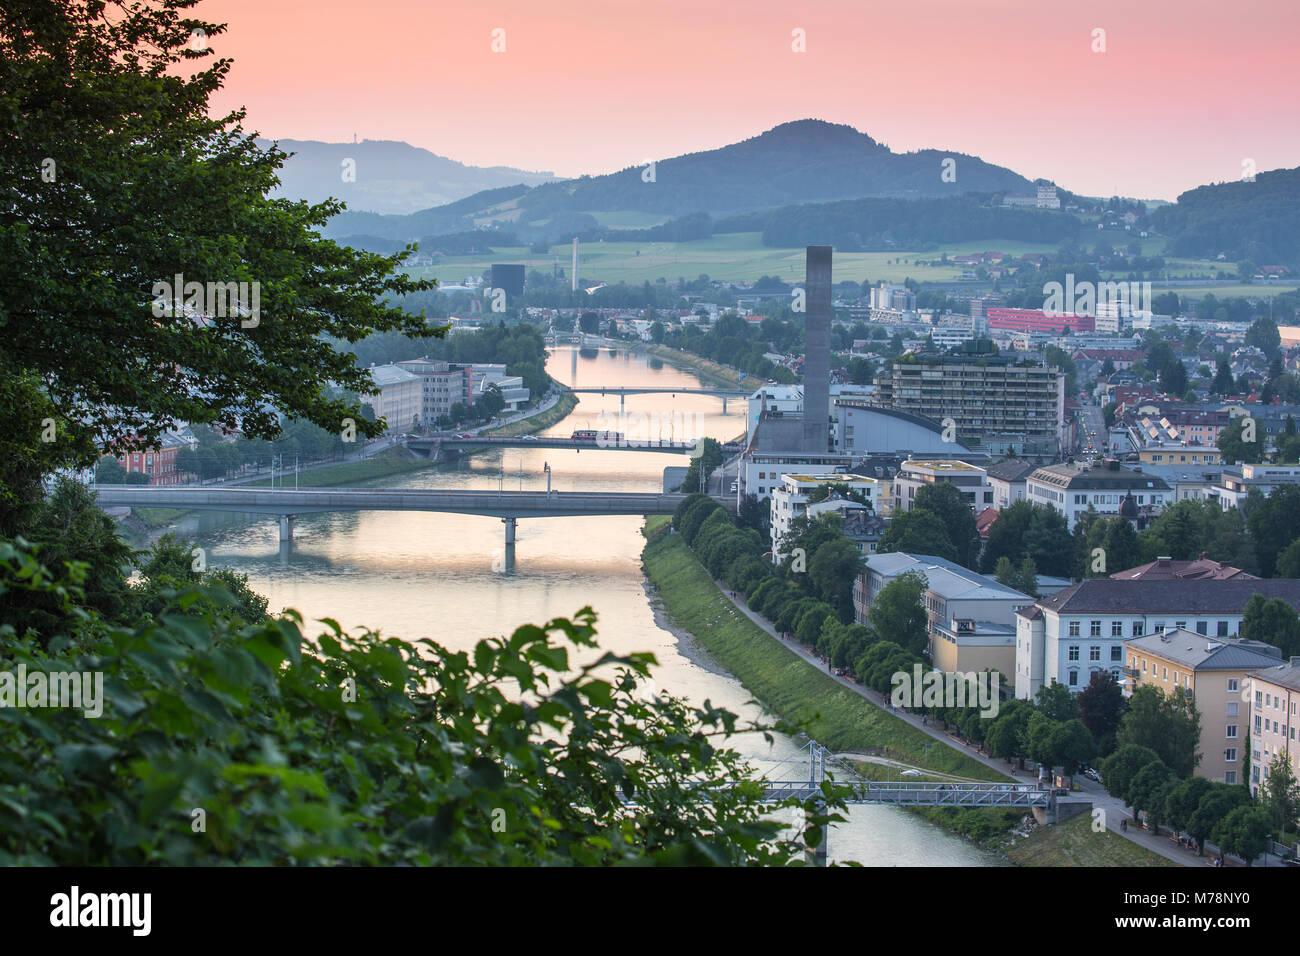 View of Salzach River, Salzburg, Austria, Europe - Stock Image